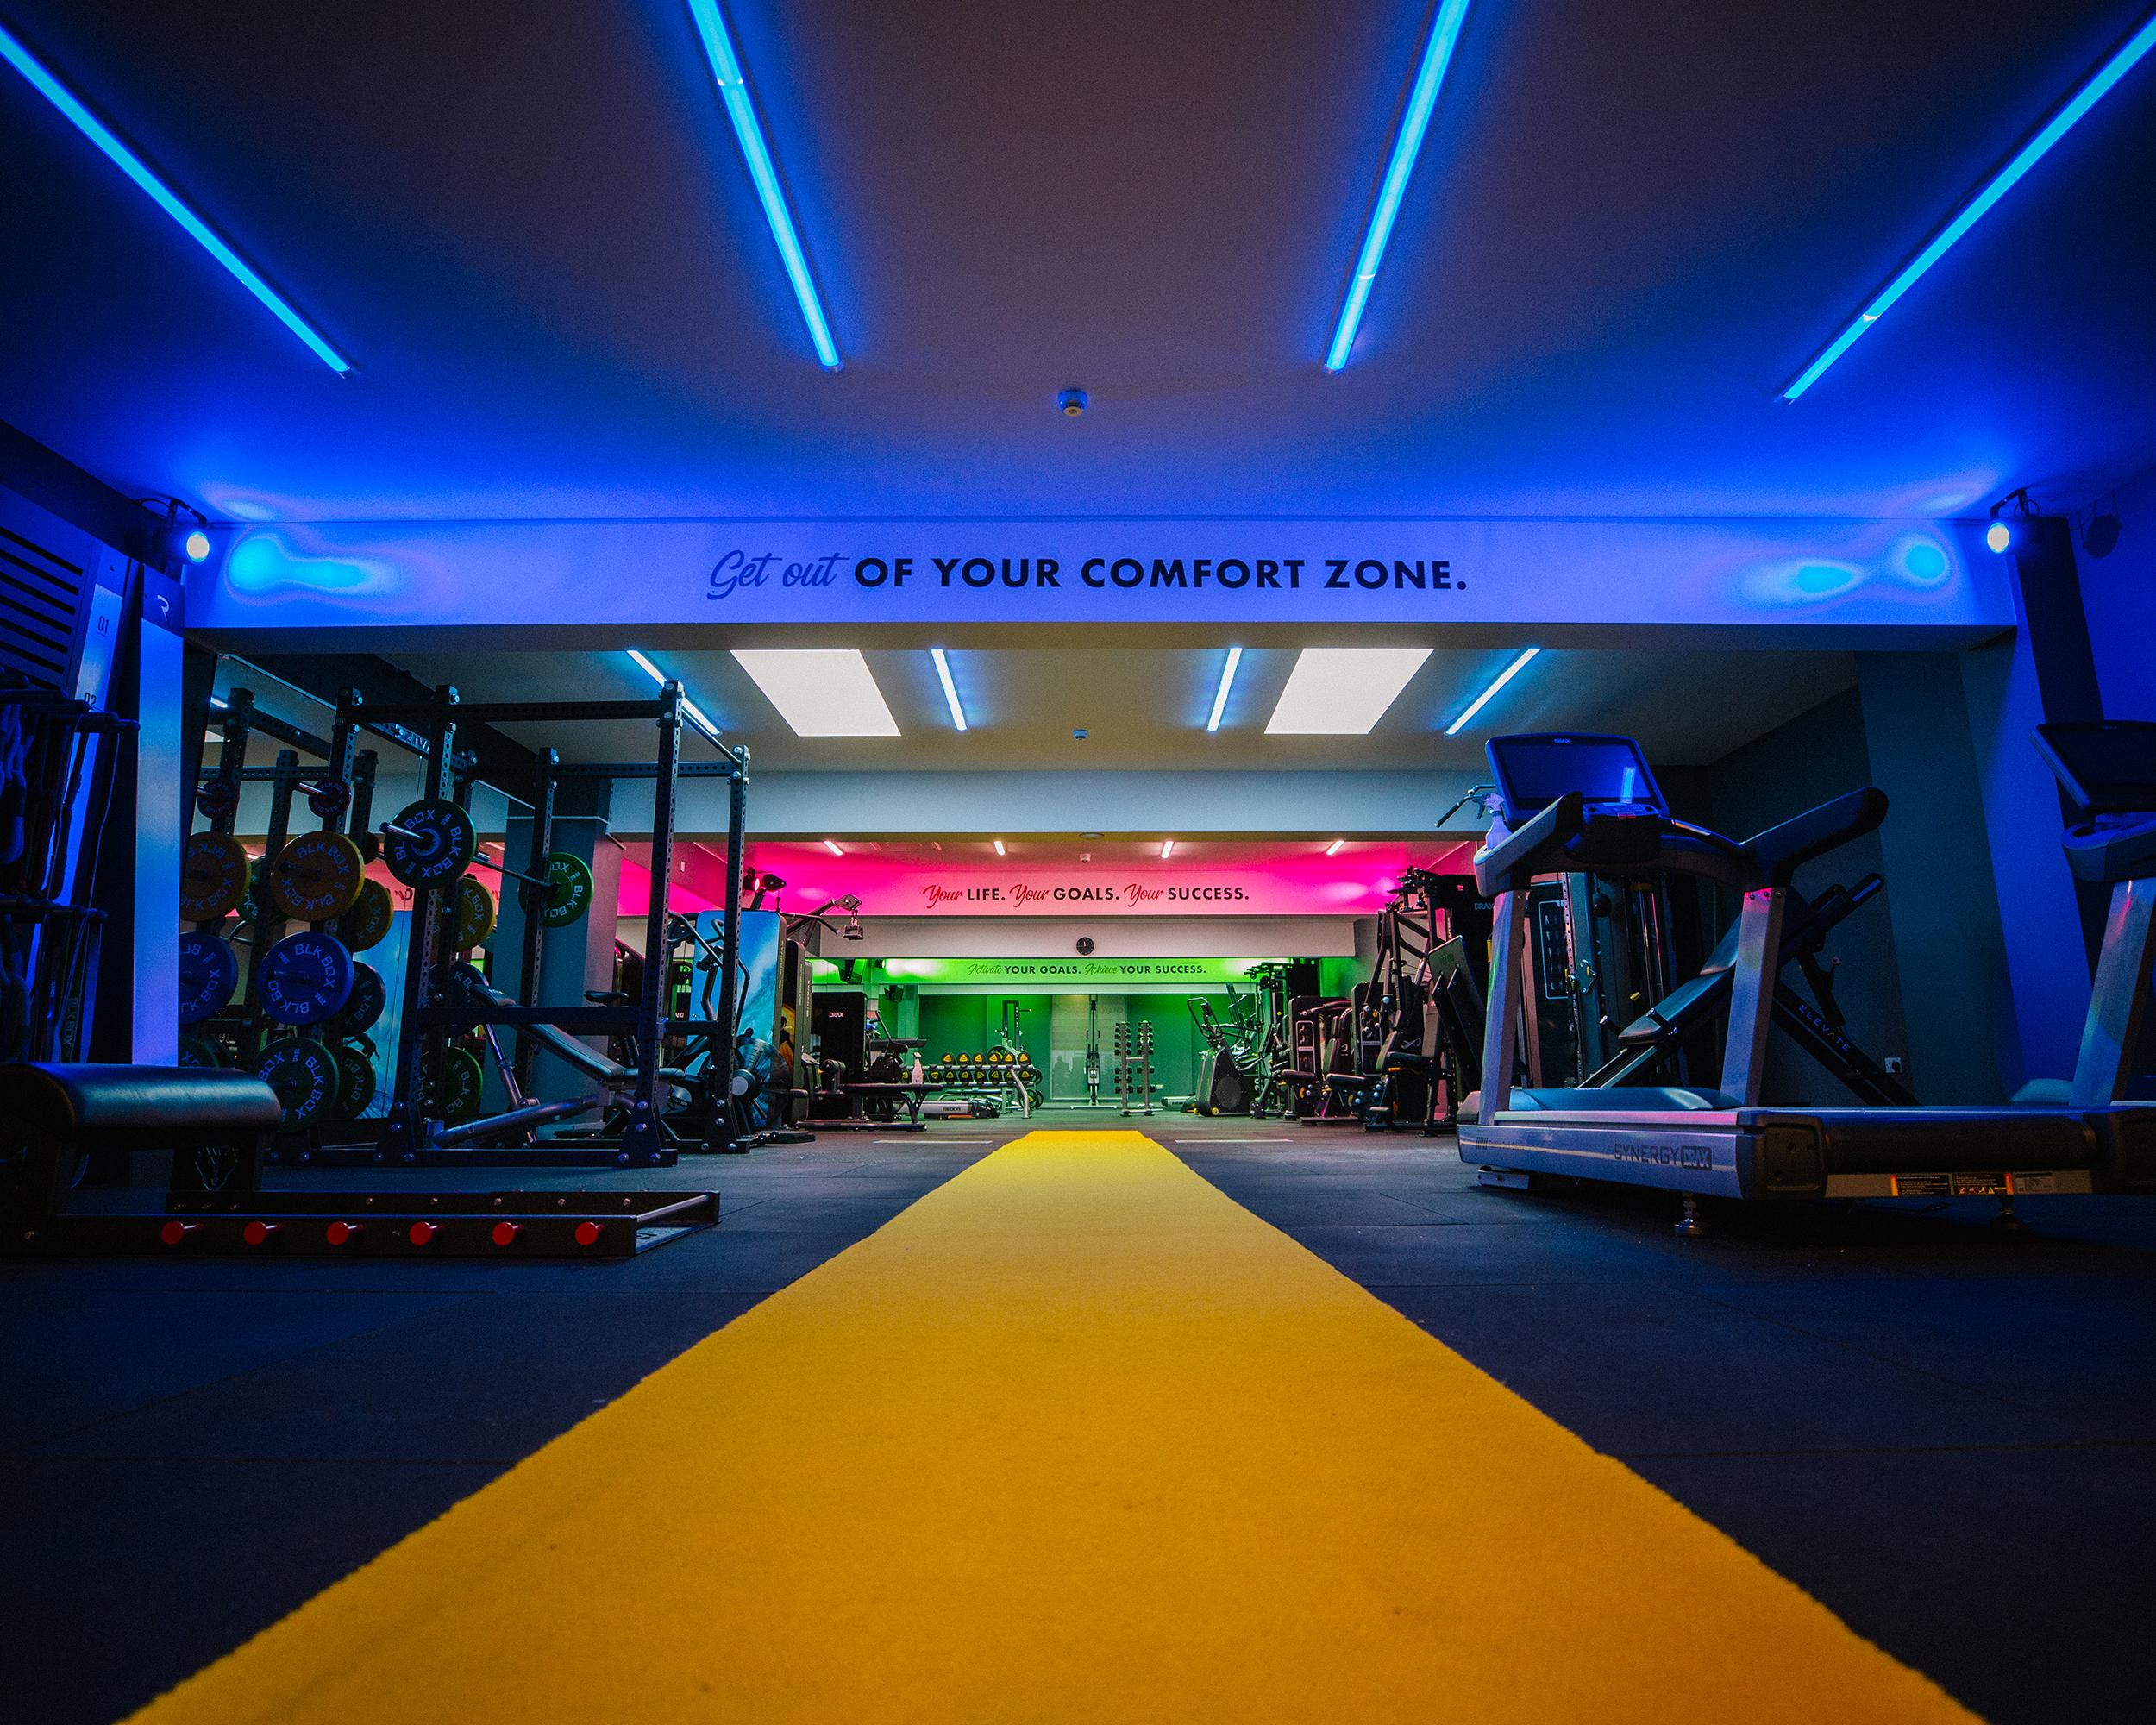 hub26 club26 free 1 day trial gym